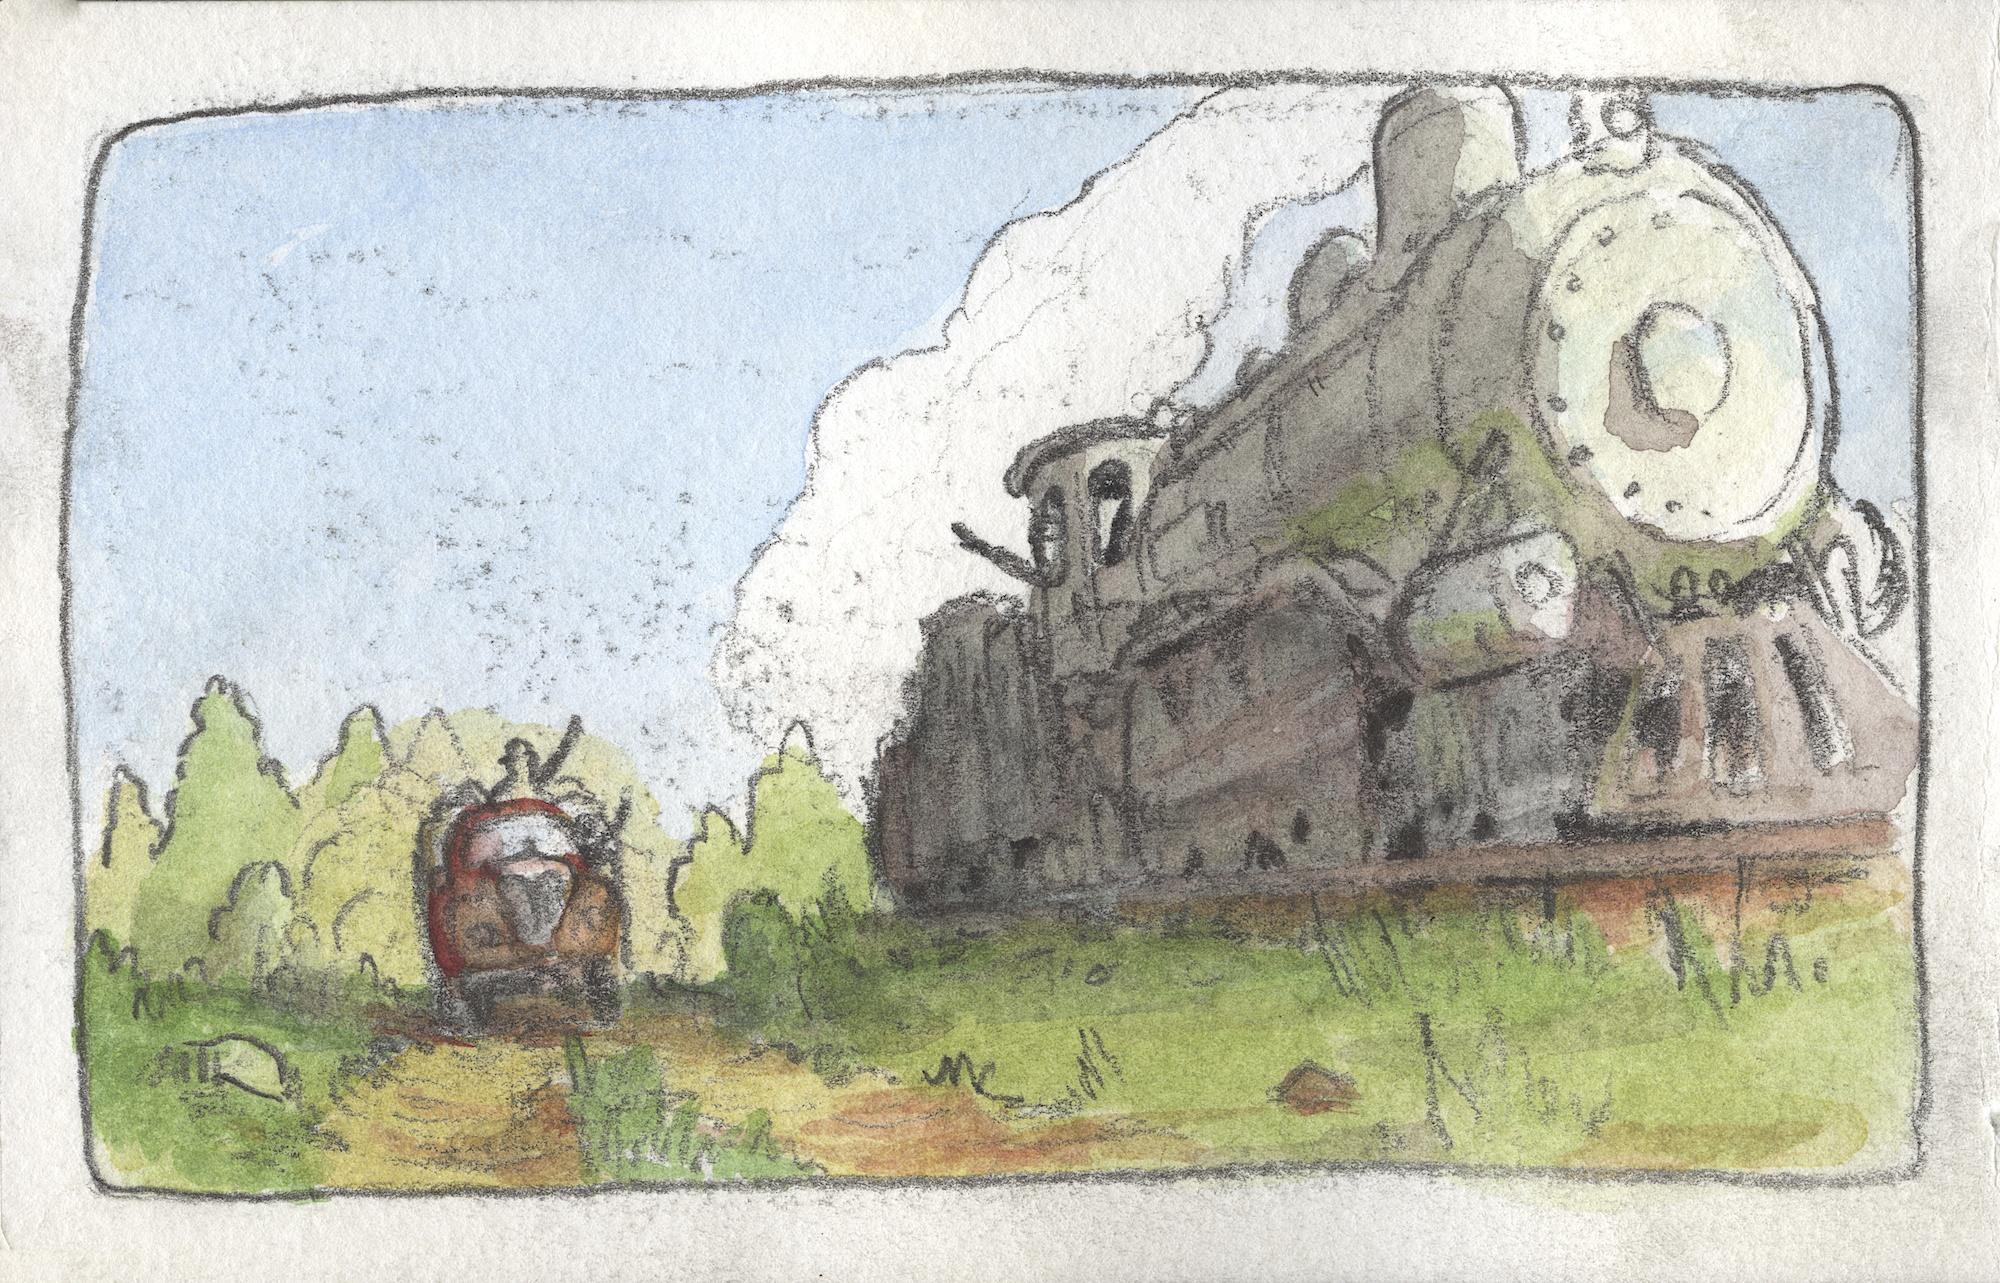 train racing a truck